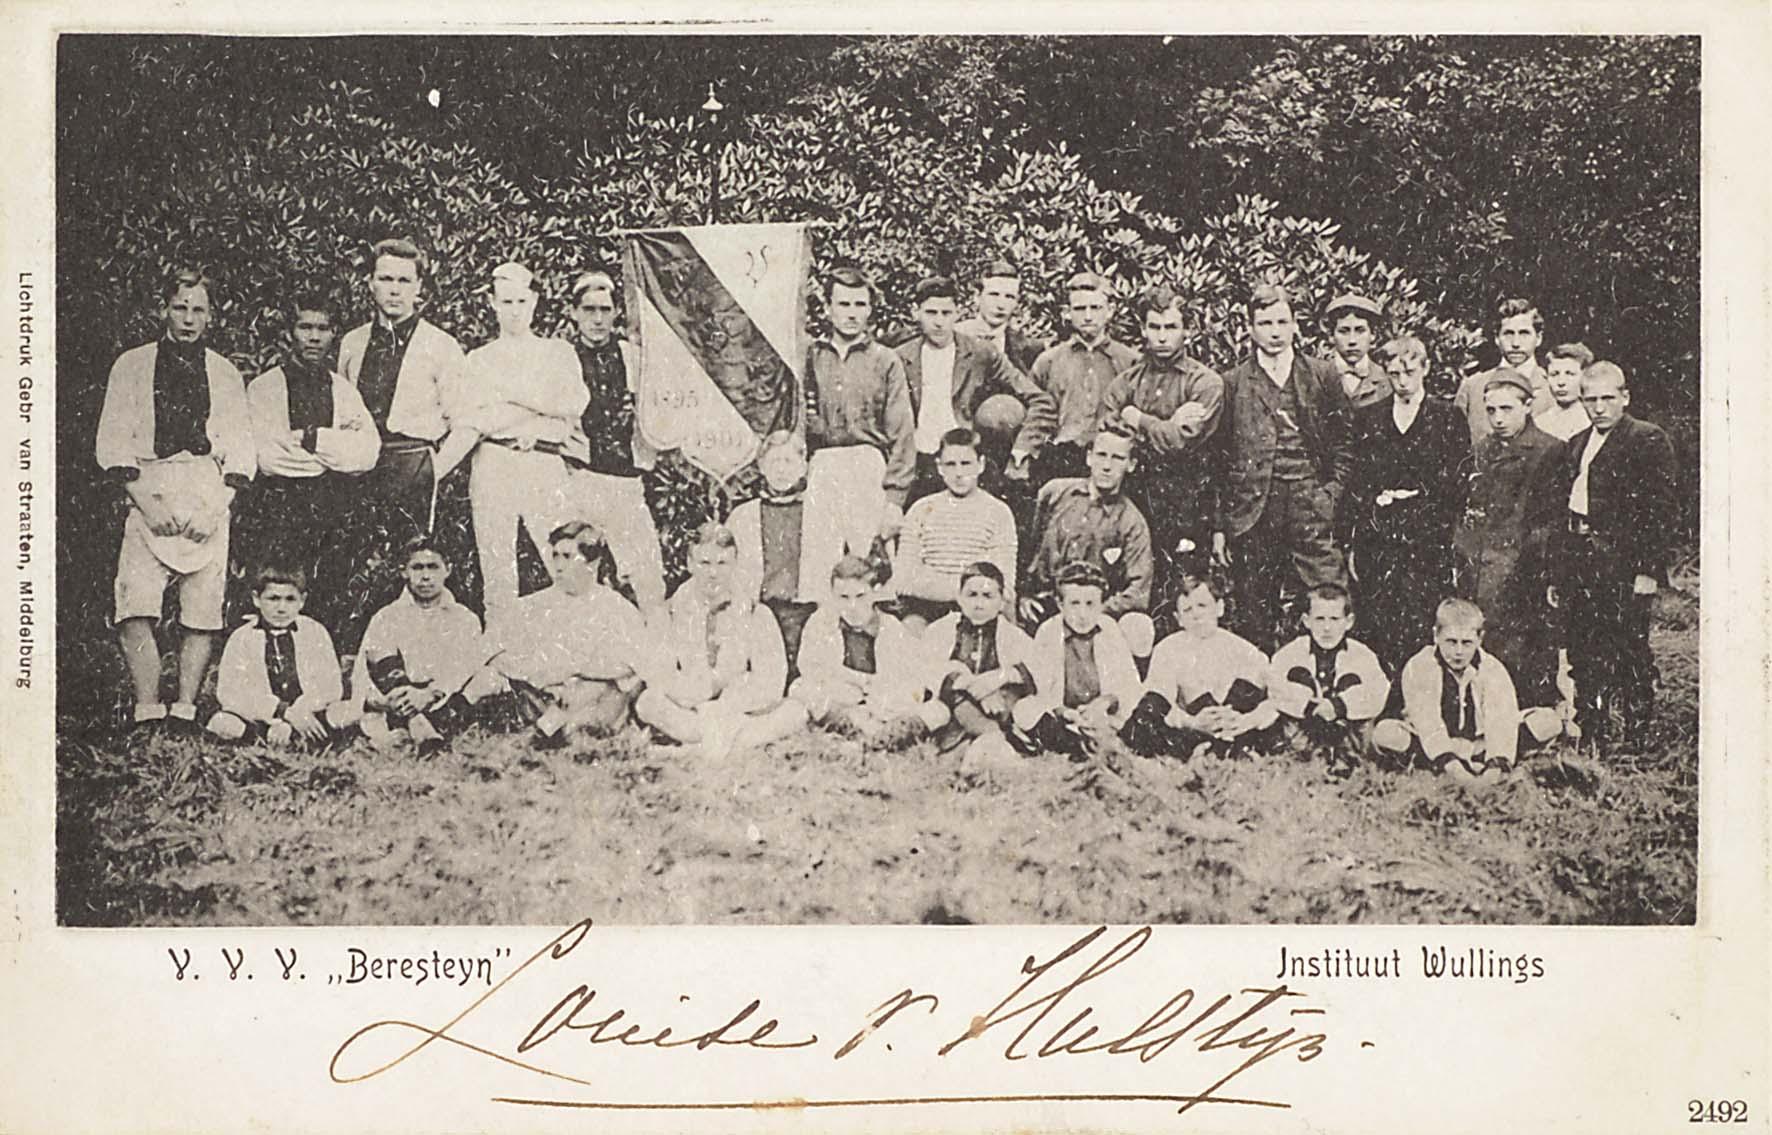 Instituut Wullings elftal met banier